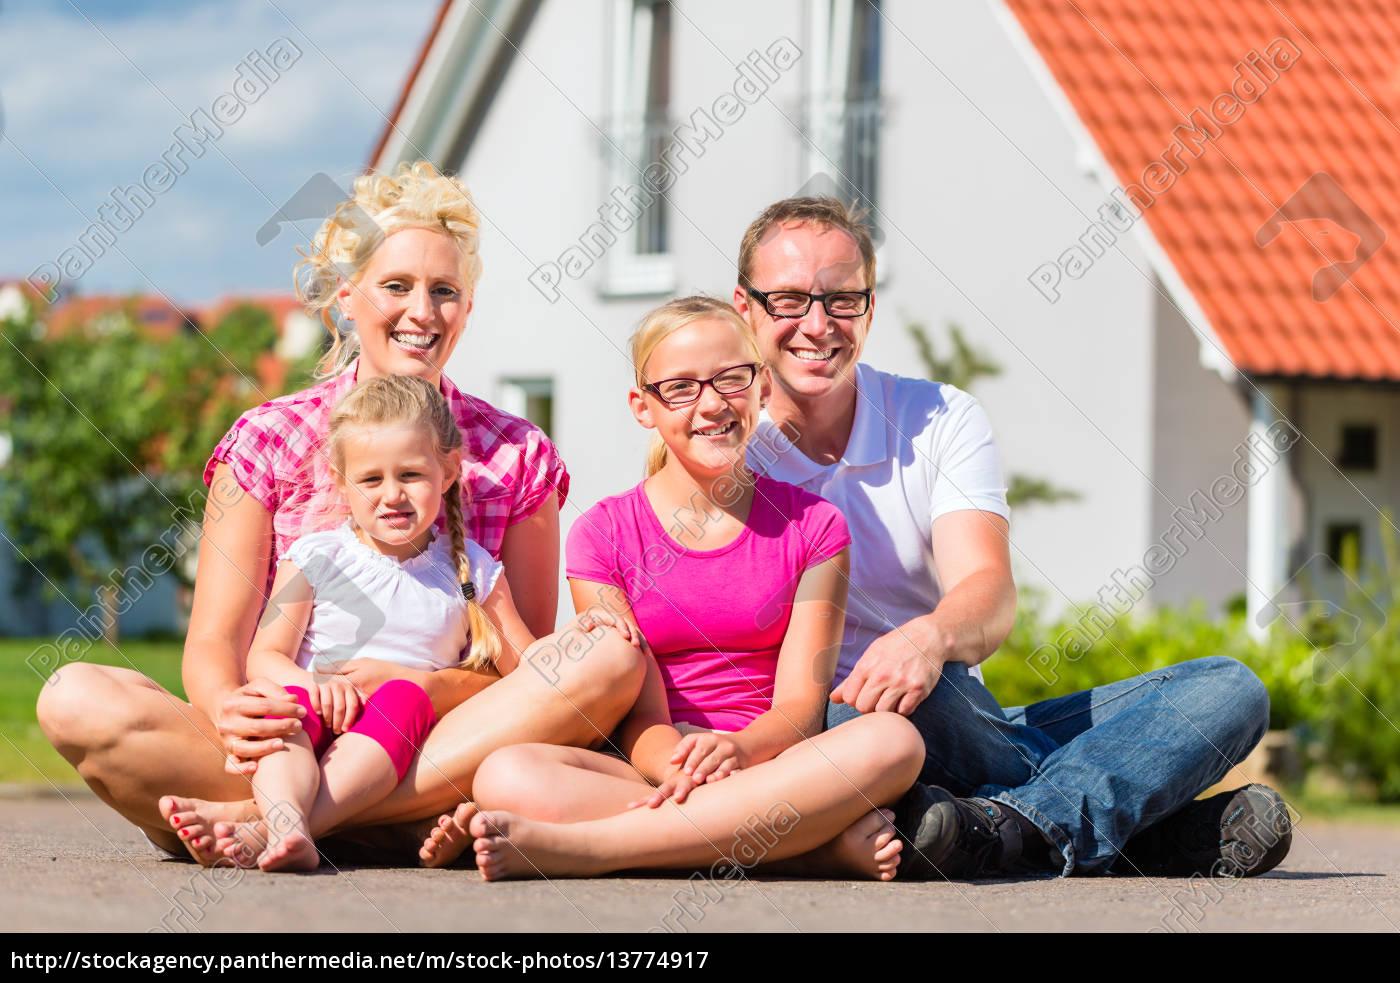 familie, steht, stolz, vor, haus - 13774917